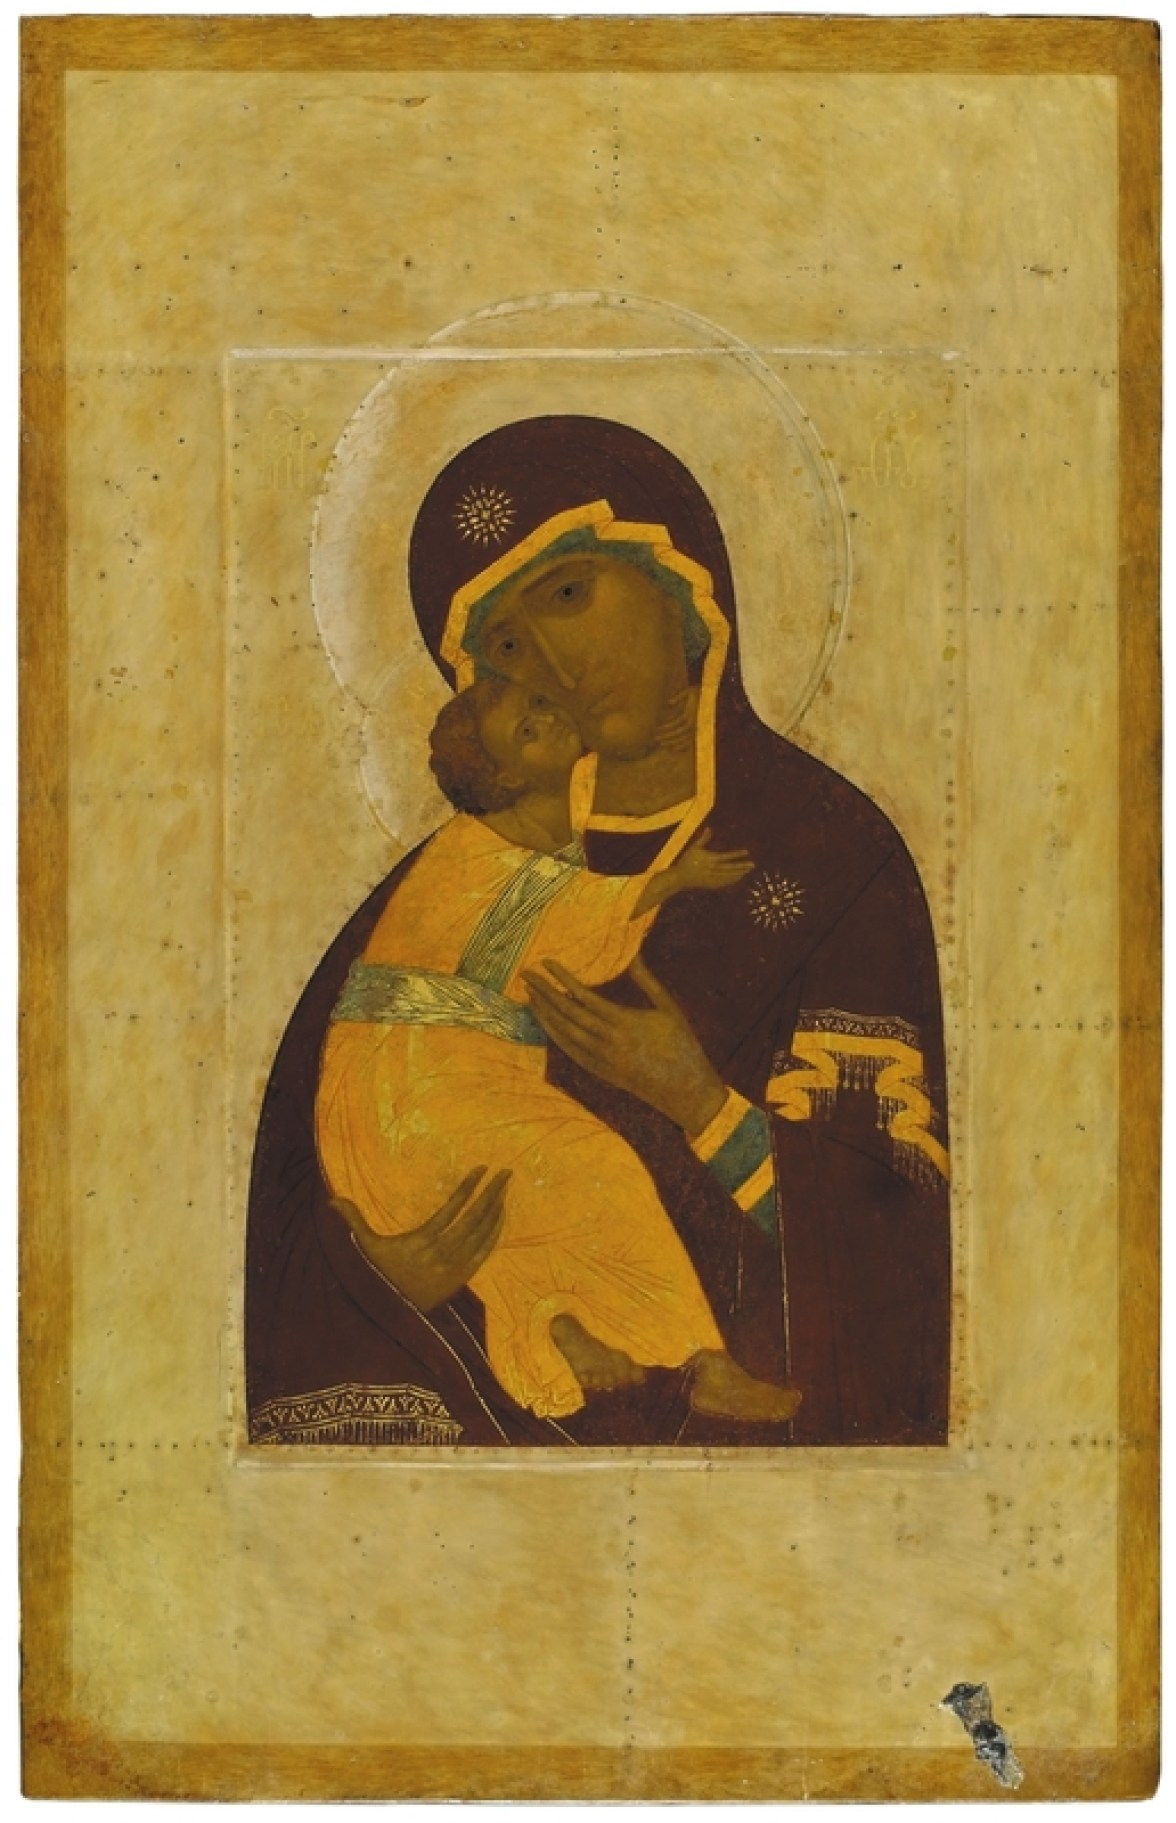 The Mother of God of Vladimir, 18th century. Tempera on wooden panel. 106 x 70 cm. Yaroslavl Art Museum, Yaroslavl, Russia.